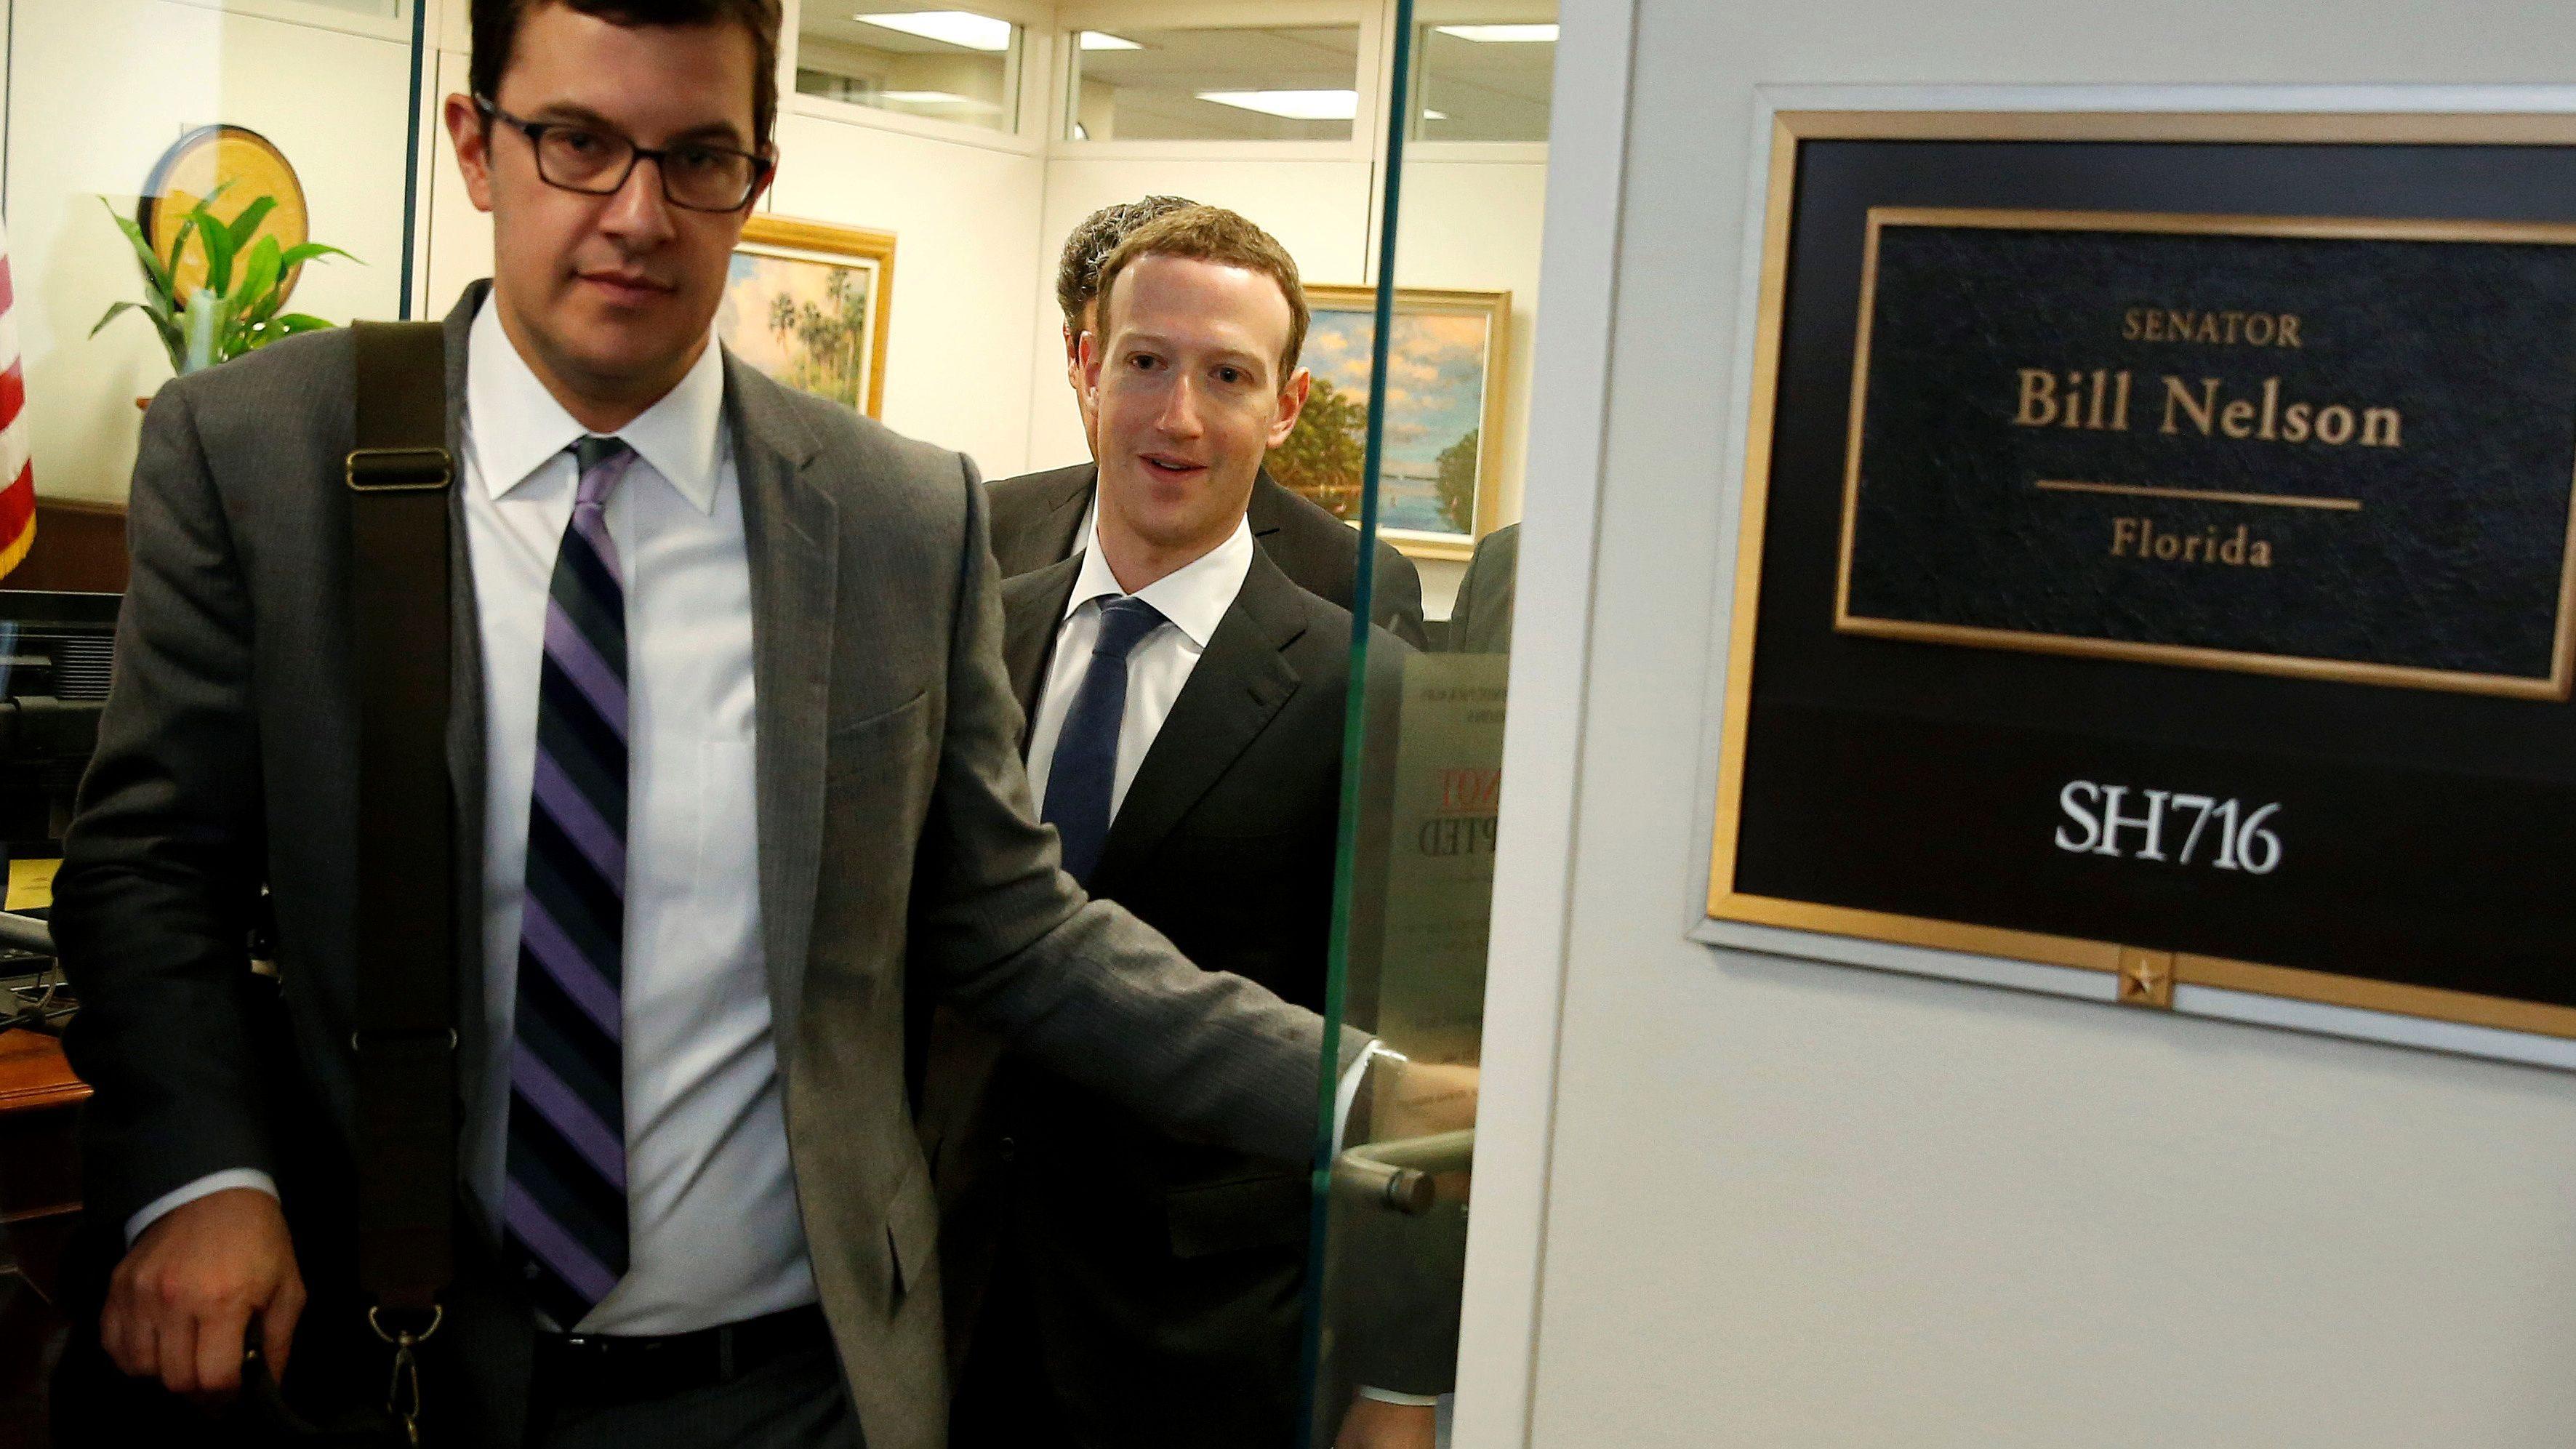 Facebook Chief Executive Officer Mark Zuckerberg leaves a meeting with Senator Bill Nelson (D-FL) on Capitol Hill in Washington, U.S., April 9, 2018.      REUTERS/Joshua Roberts - RC1F89C0EEB0